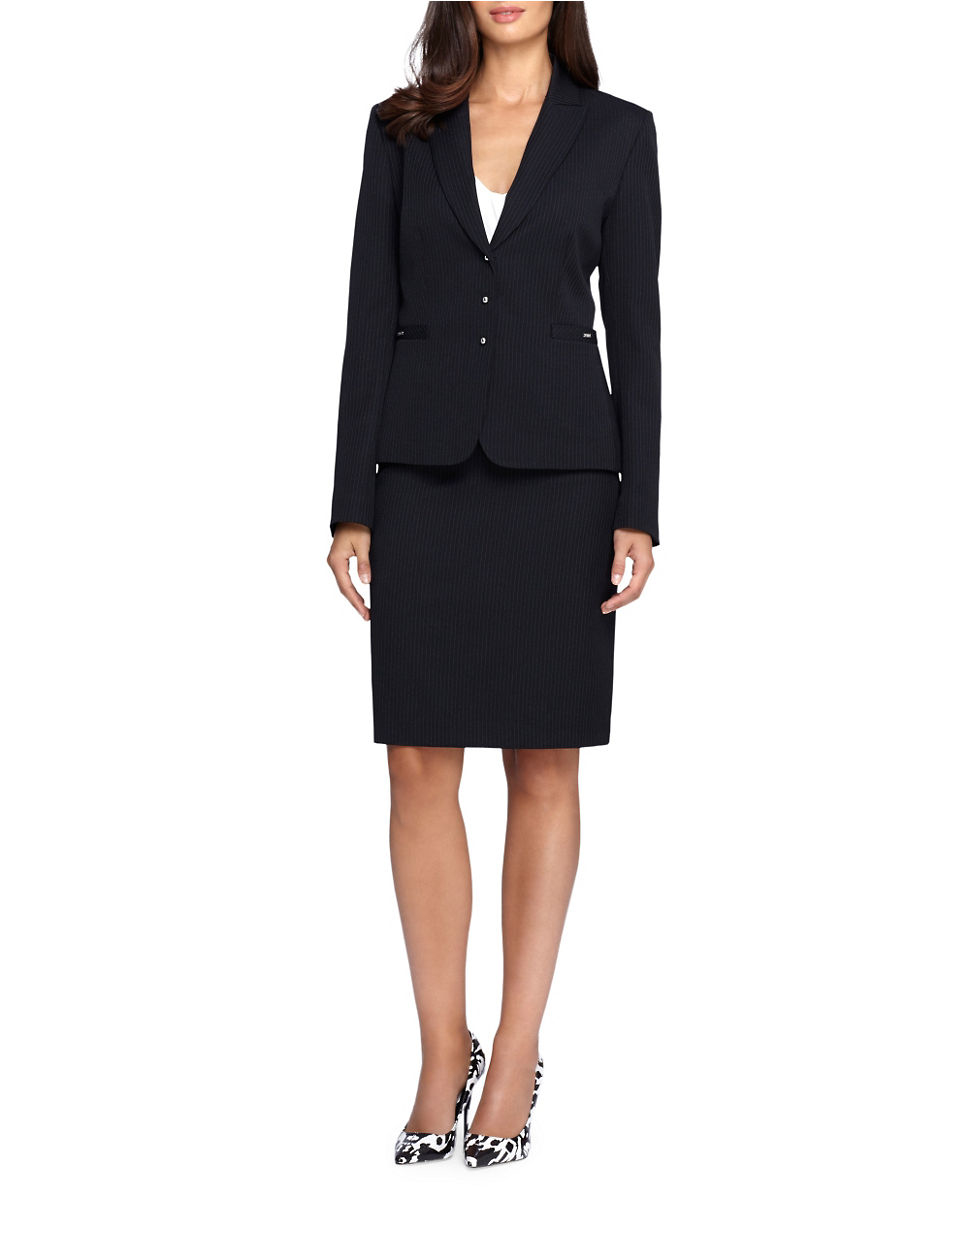 Black Pinstriped Suit 29